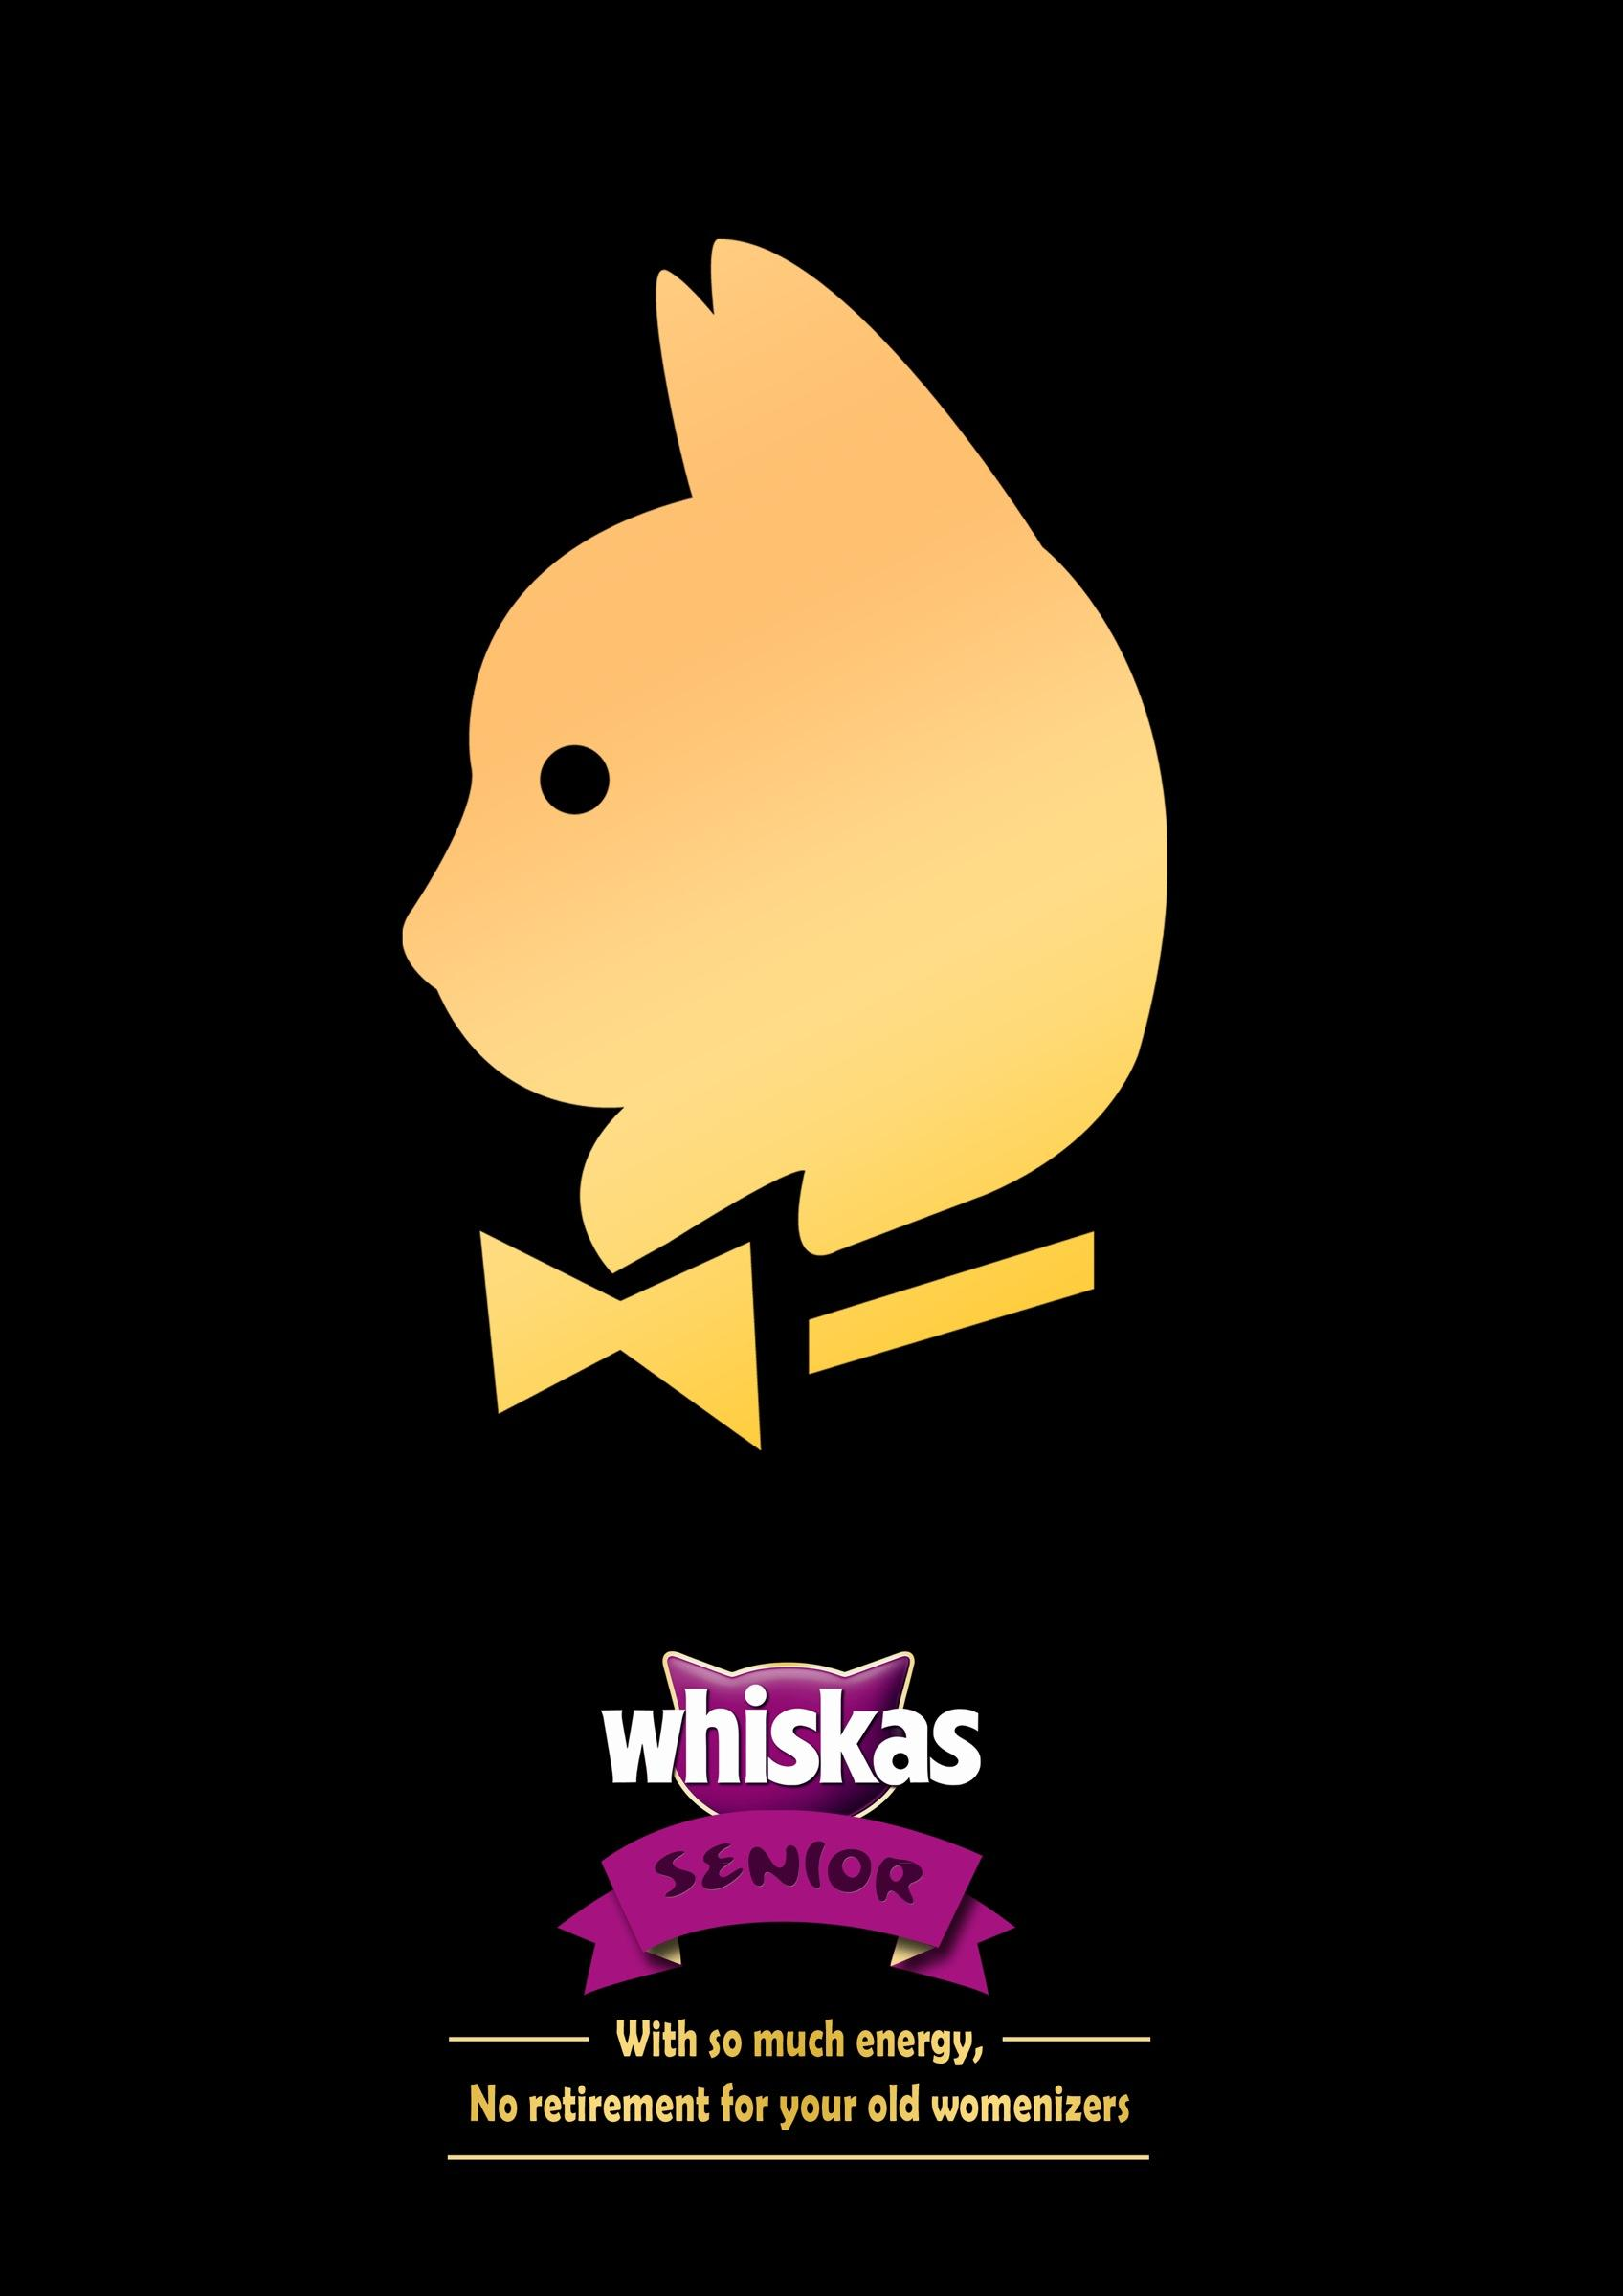 Whiskas Print Ad -  No retirement, 2